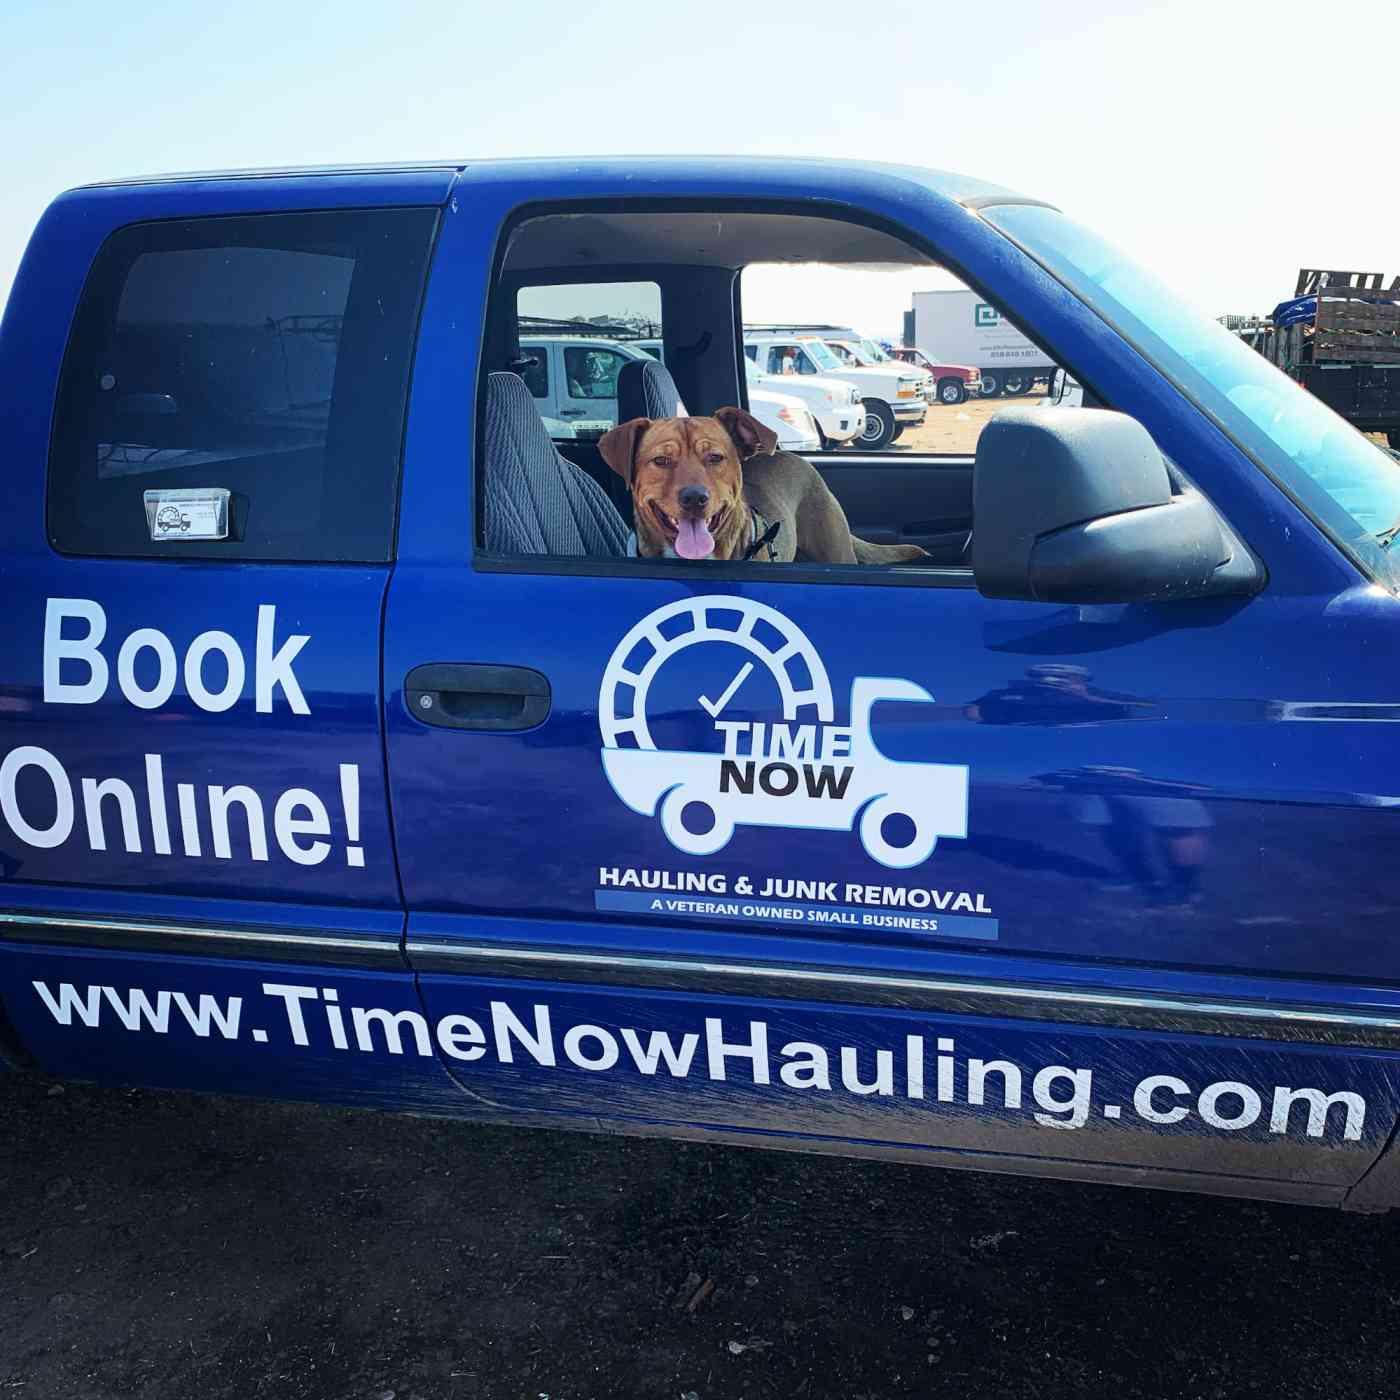 A dog in a hauling truck